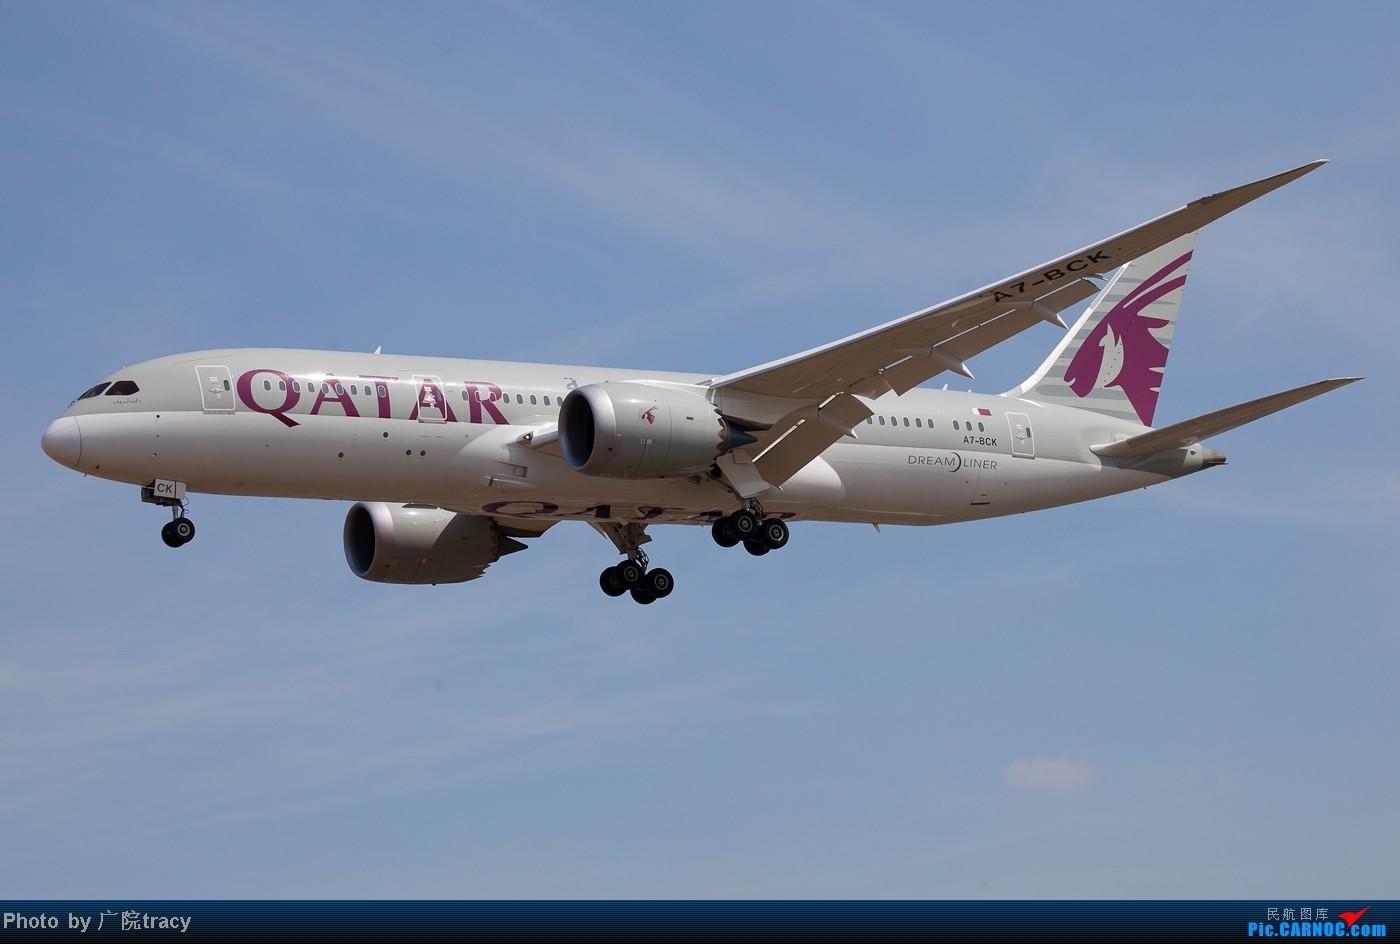 Re:[原创]★ ★ ★ ★ ★目前已经拍到了9家航空公司的波音787梦想客机★ ★ ★ ★ ★ BOEING 787-8 A7-BCK 英国伦敦希思罗机场